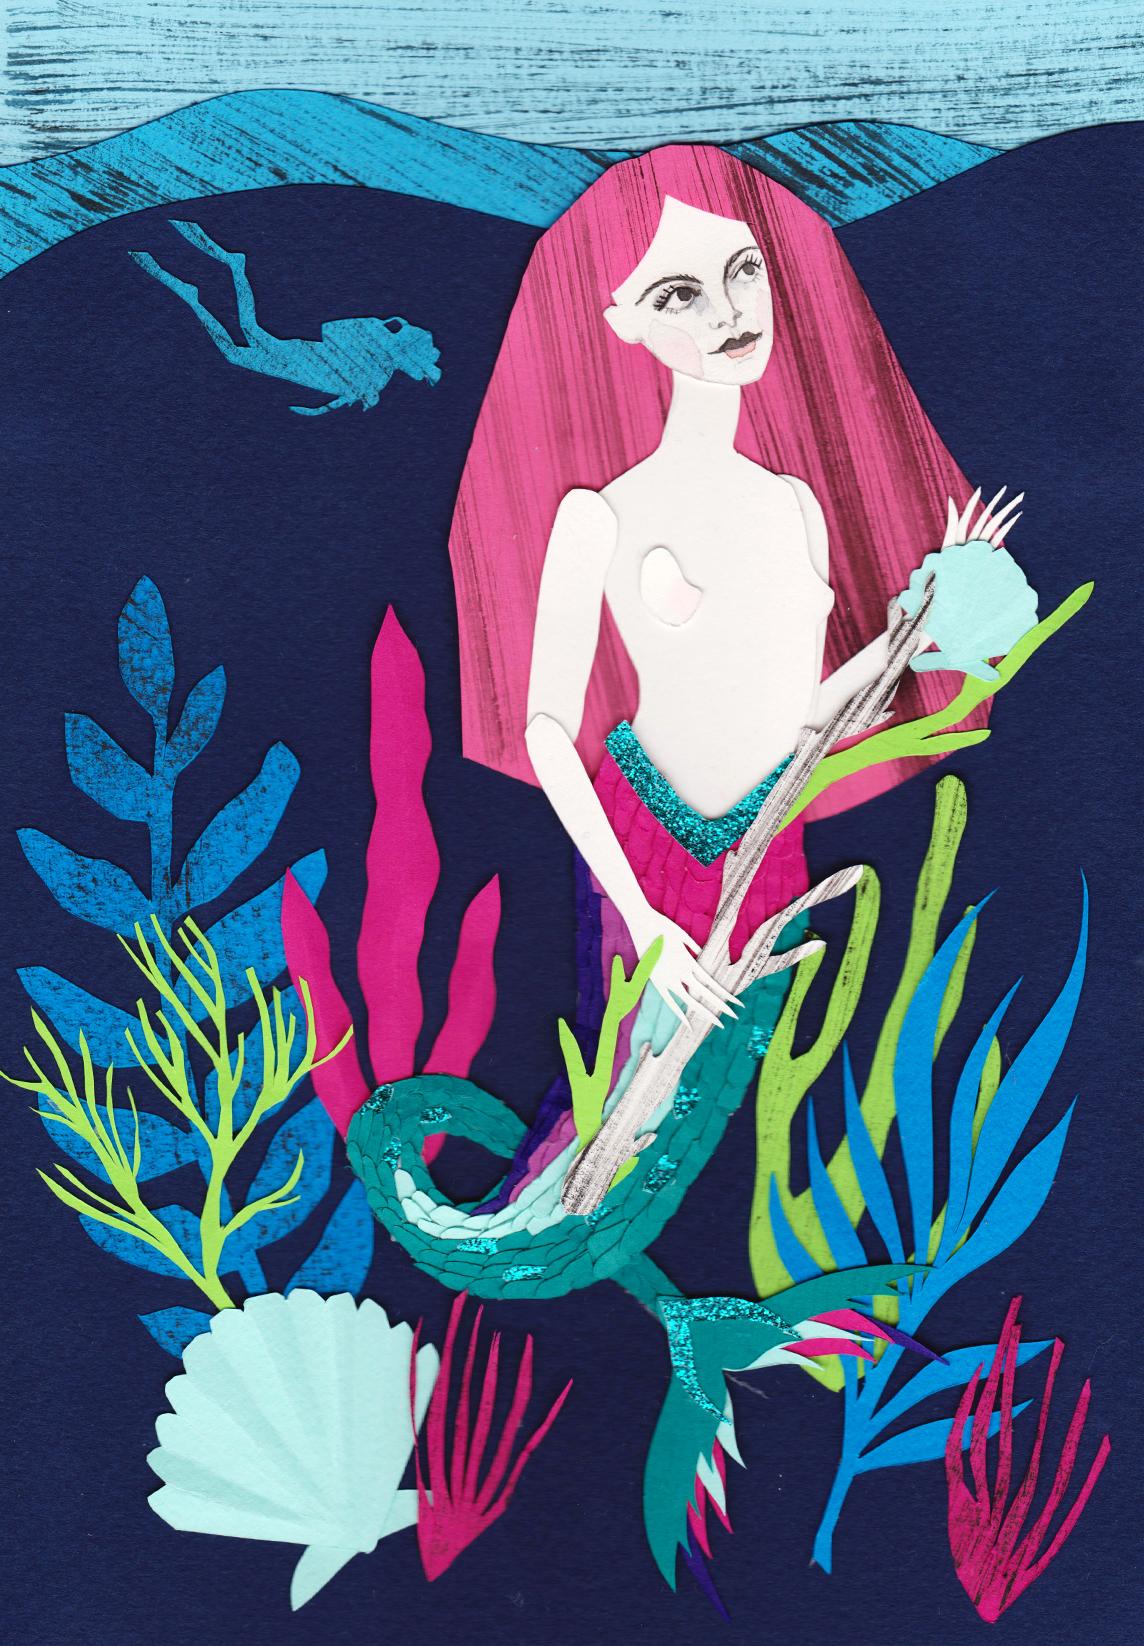 Mermaids Papercut Illustration